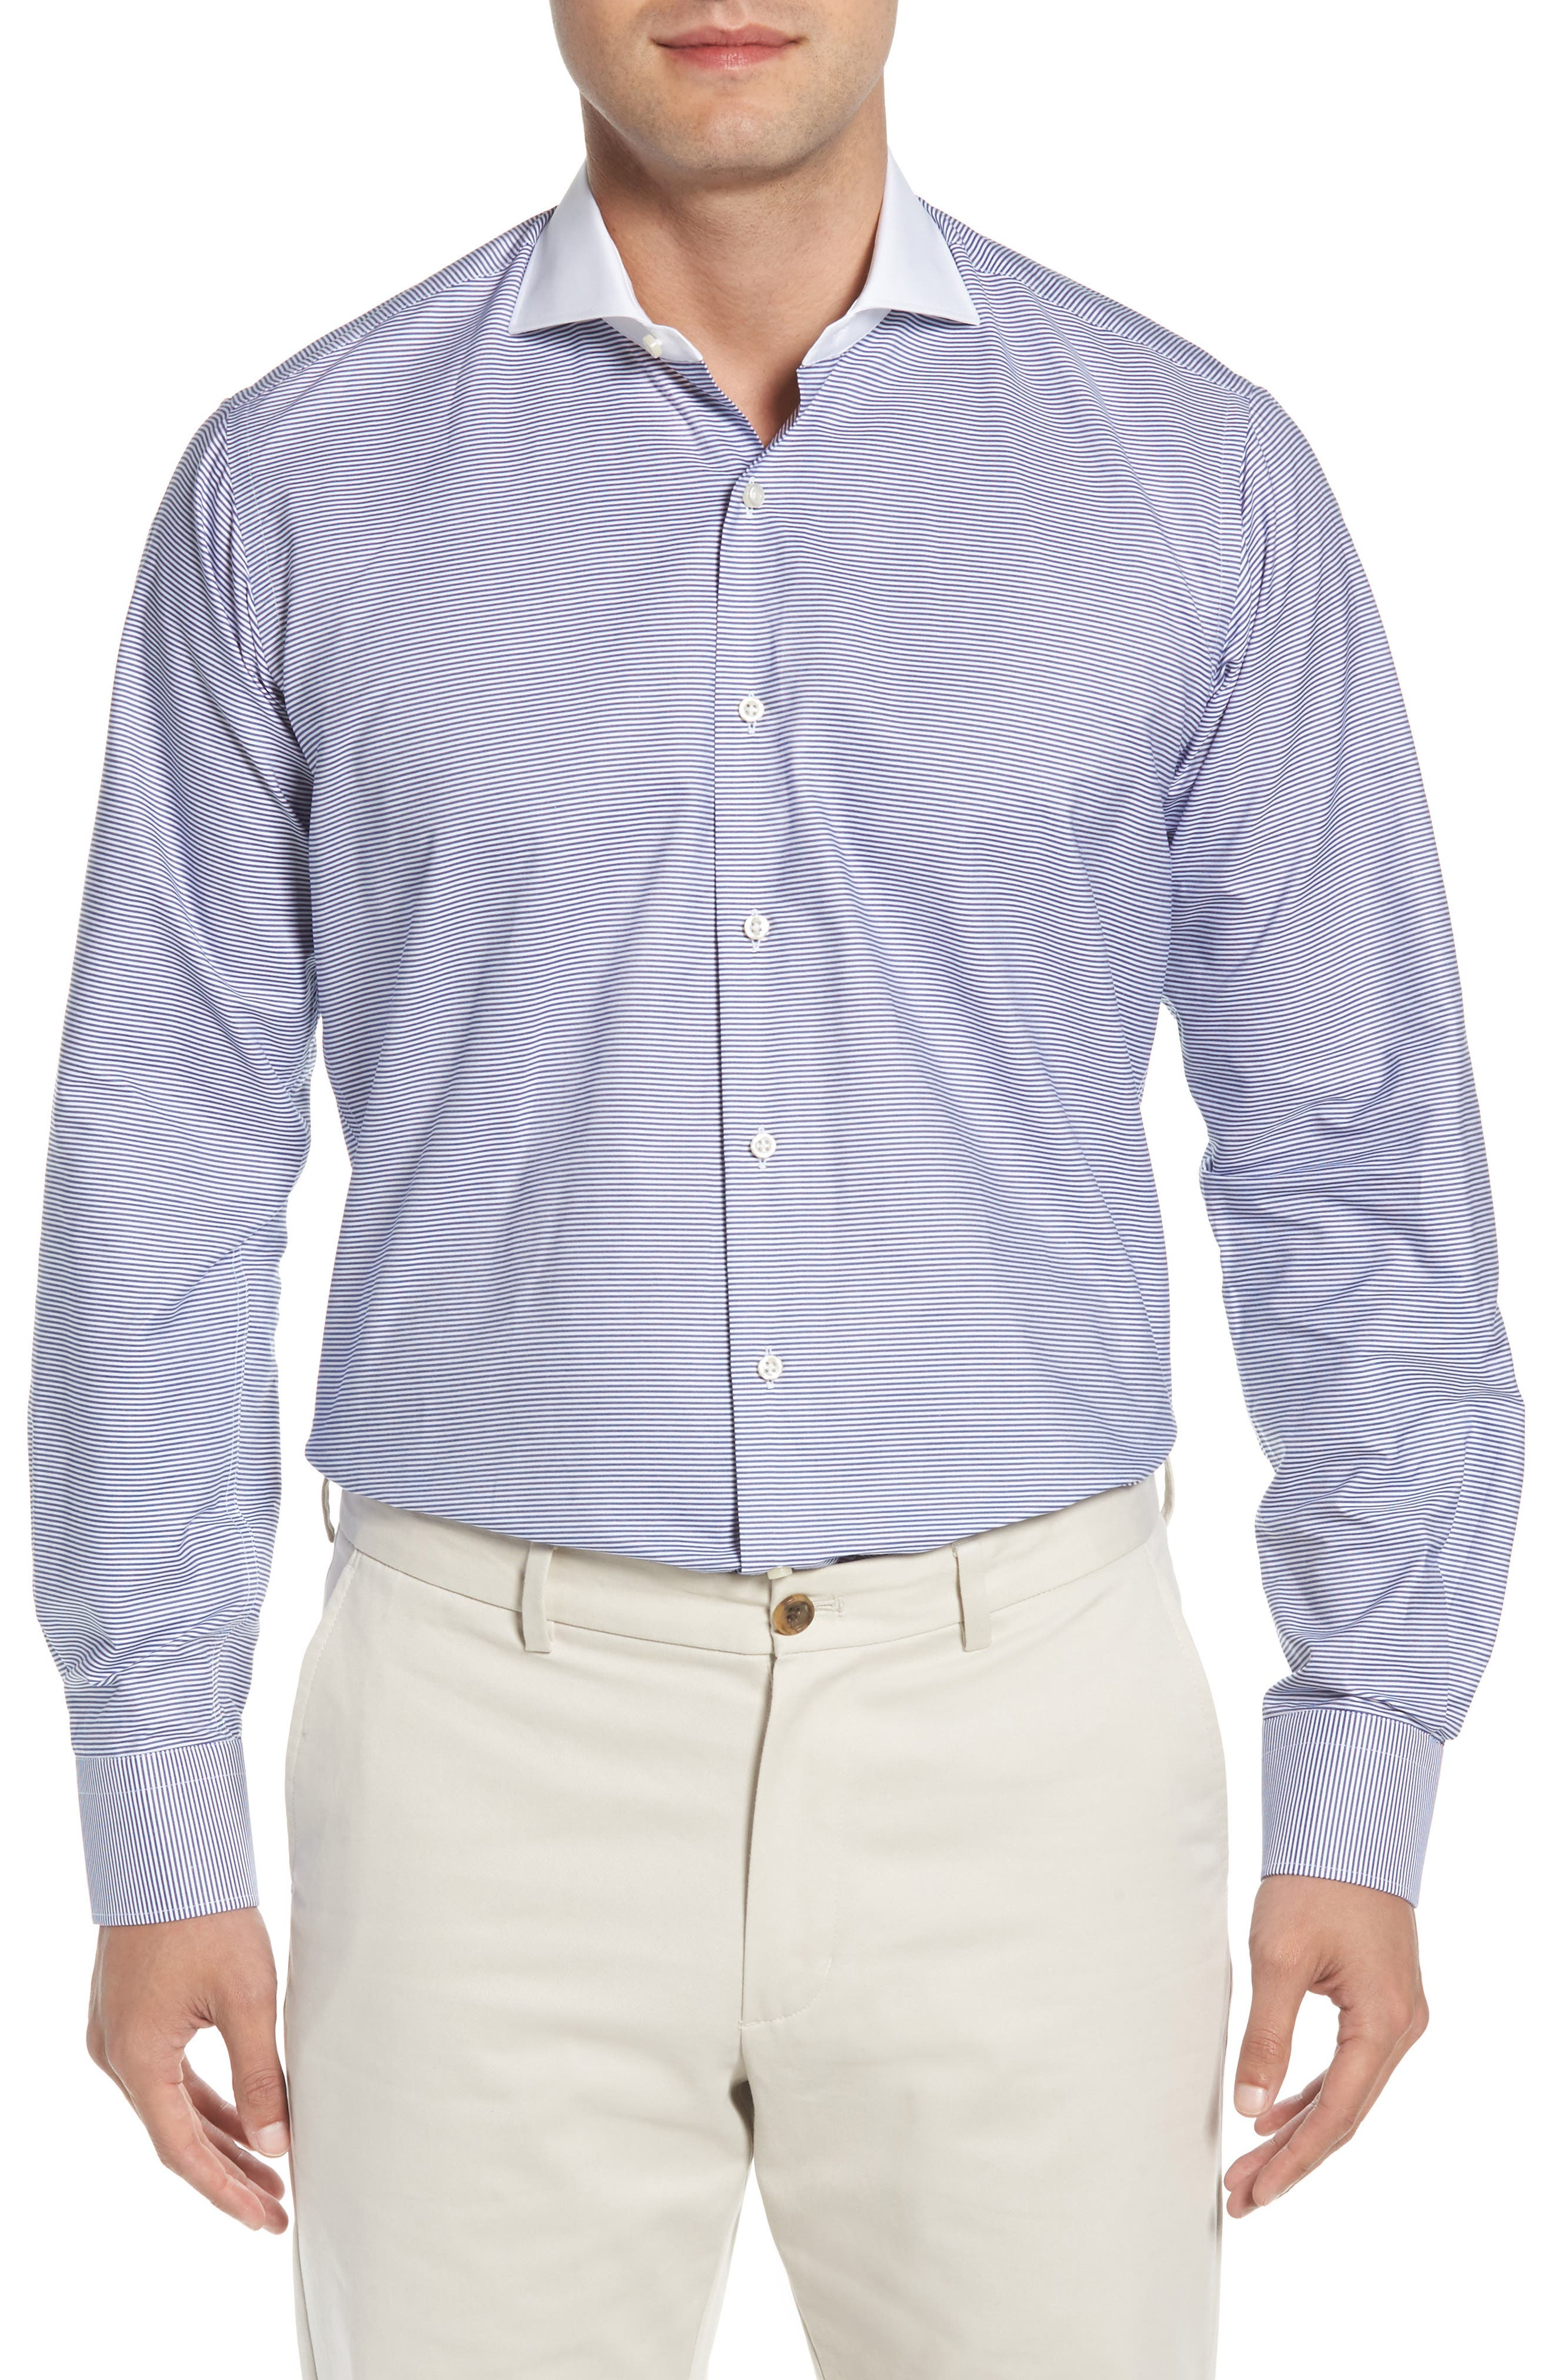 Regular Fit Stripe Dress Shirt,                             Main thumbnail 1, color,                             400